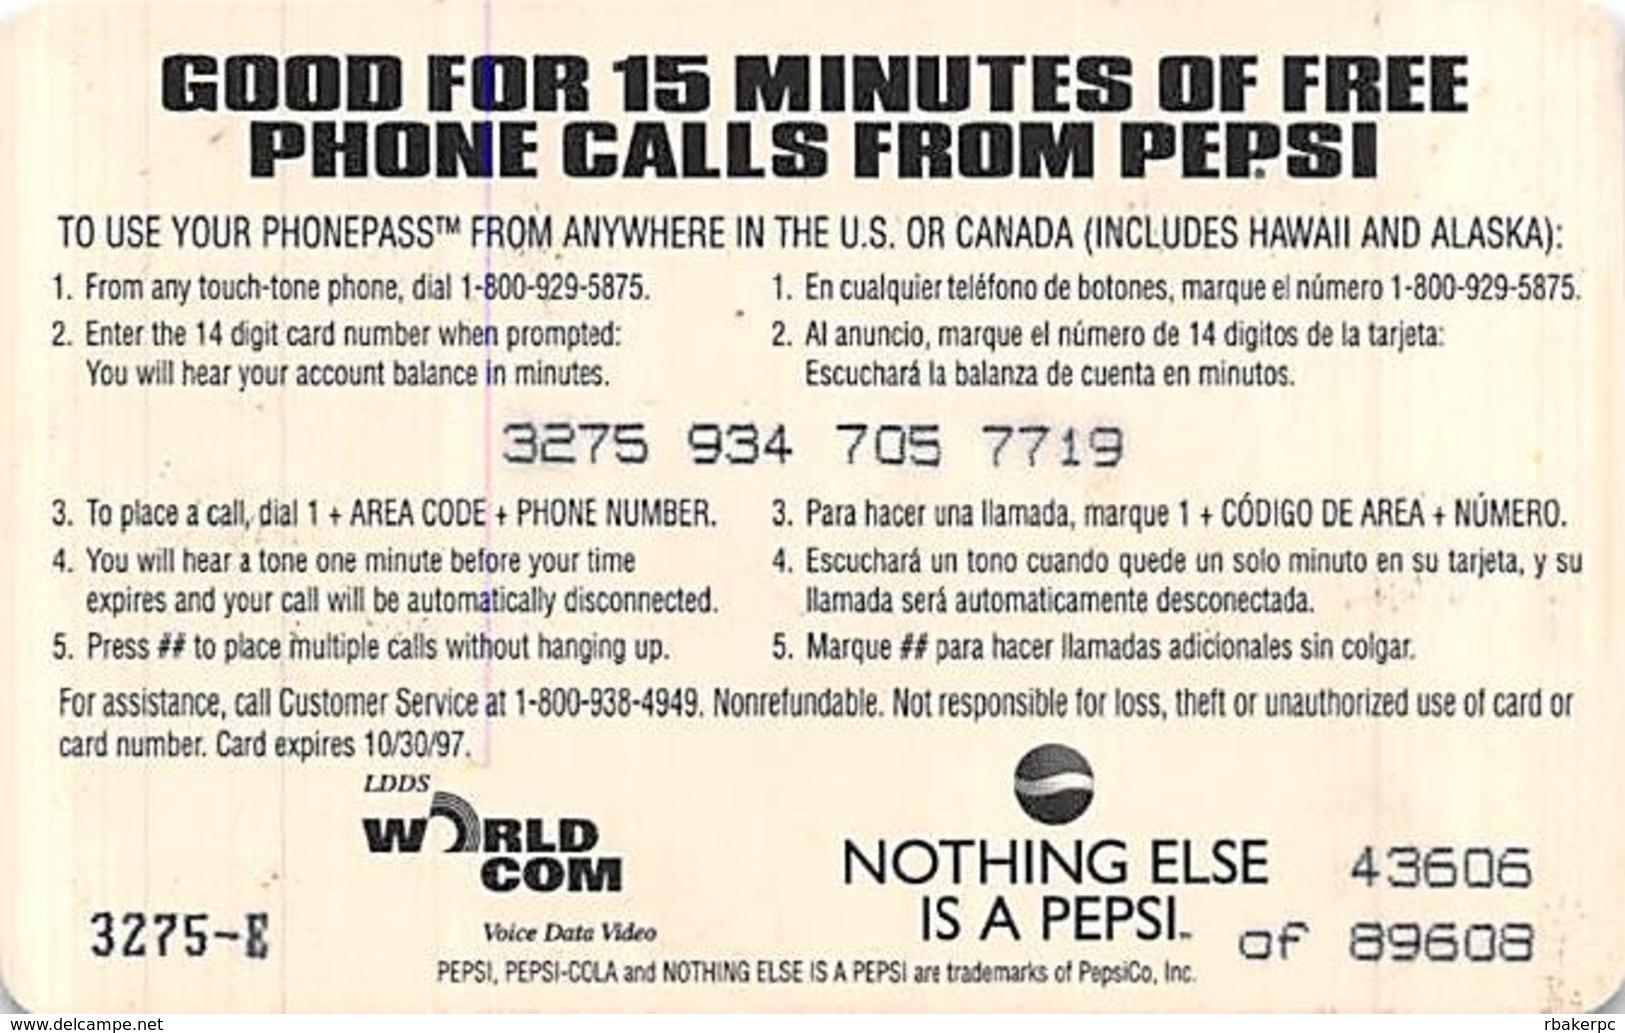 Pepsi / WorldCom PrePaid Phone Card 15 Minutes - Advertising